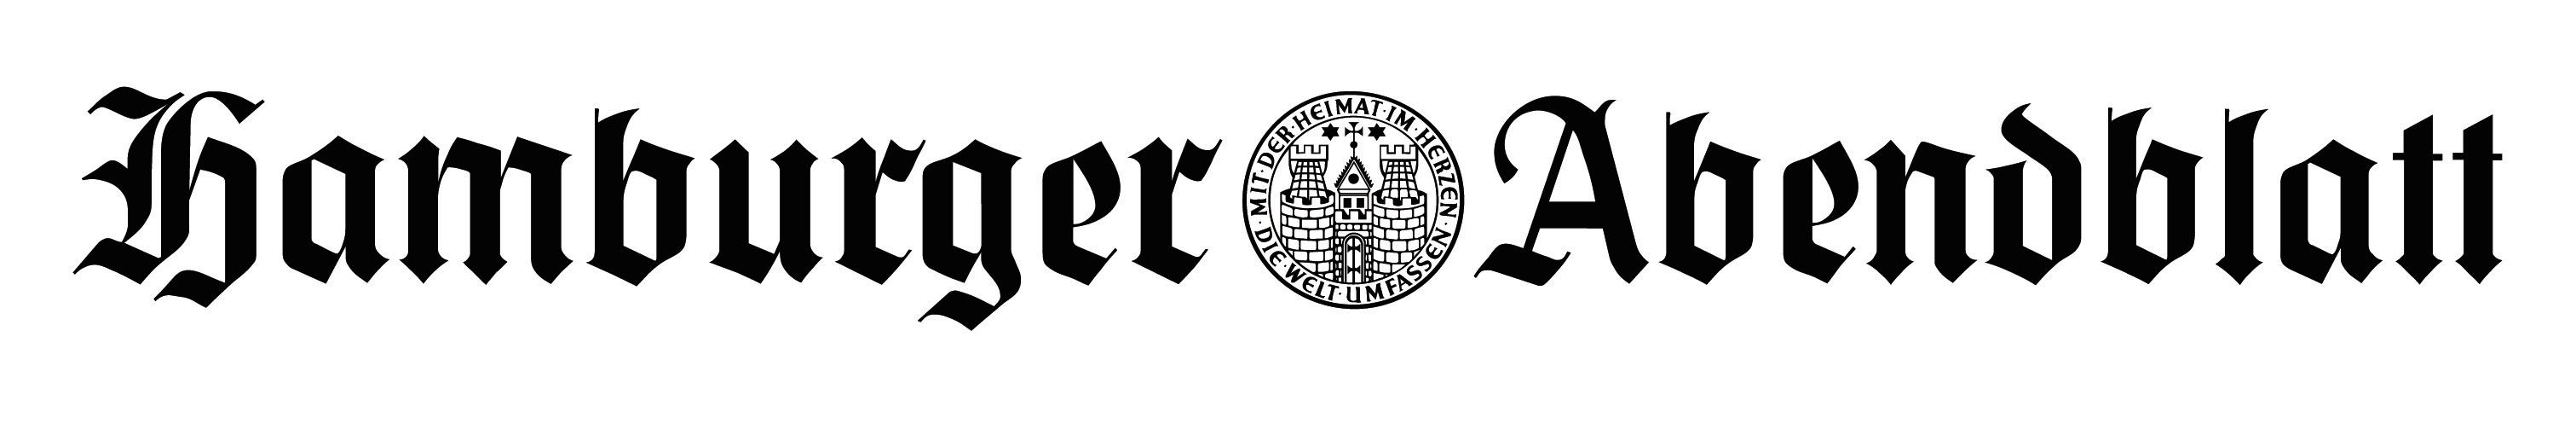 https://www.in-shape.coach/wp-content/uploads/2017/07/logo_hamburger_abendblatt.jpg